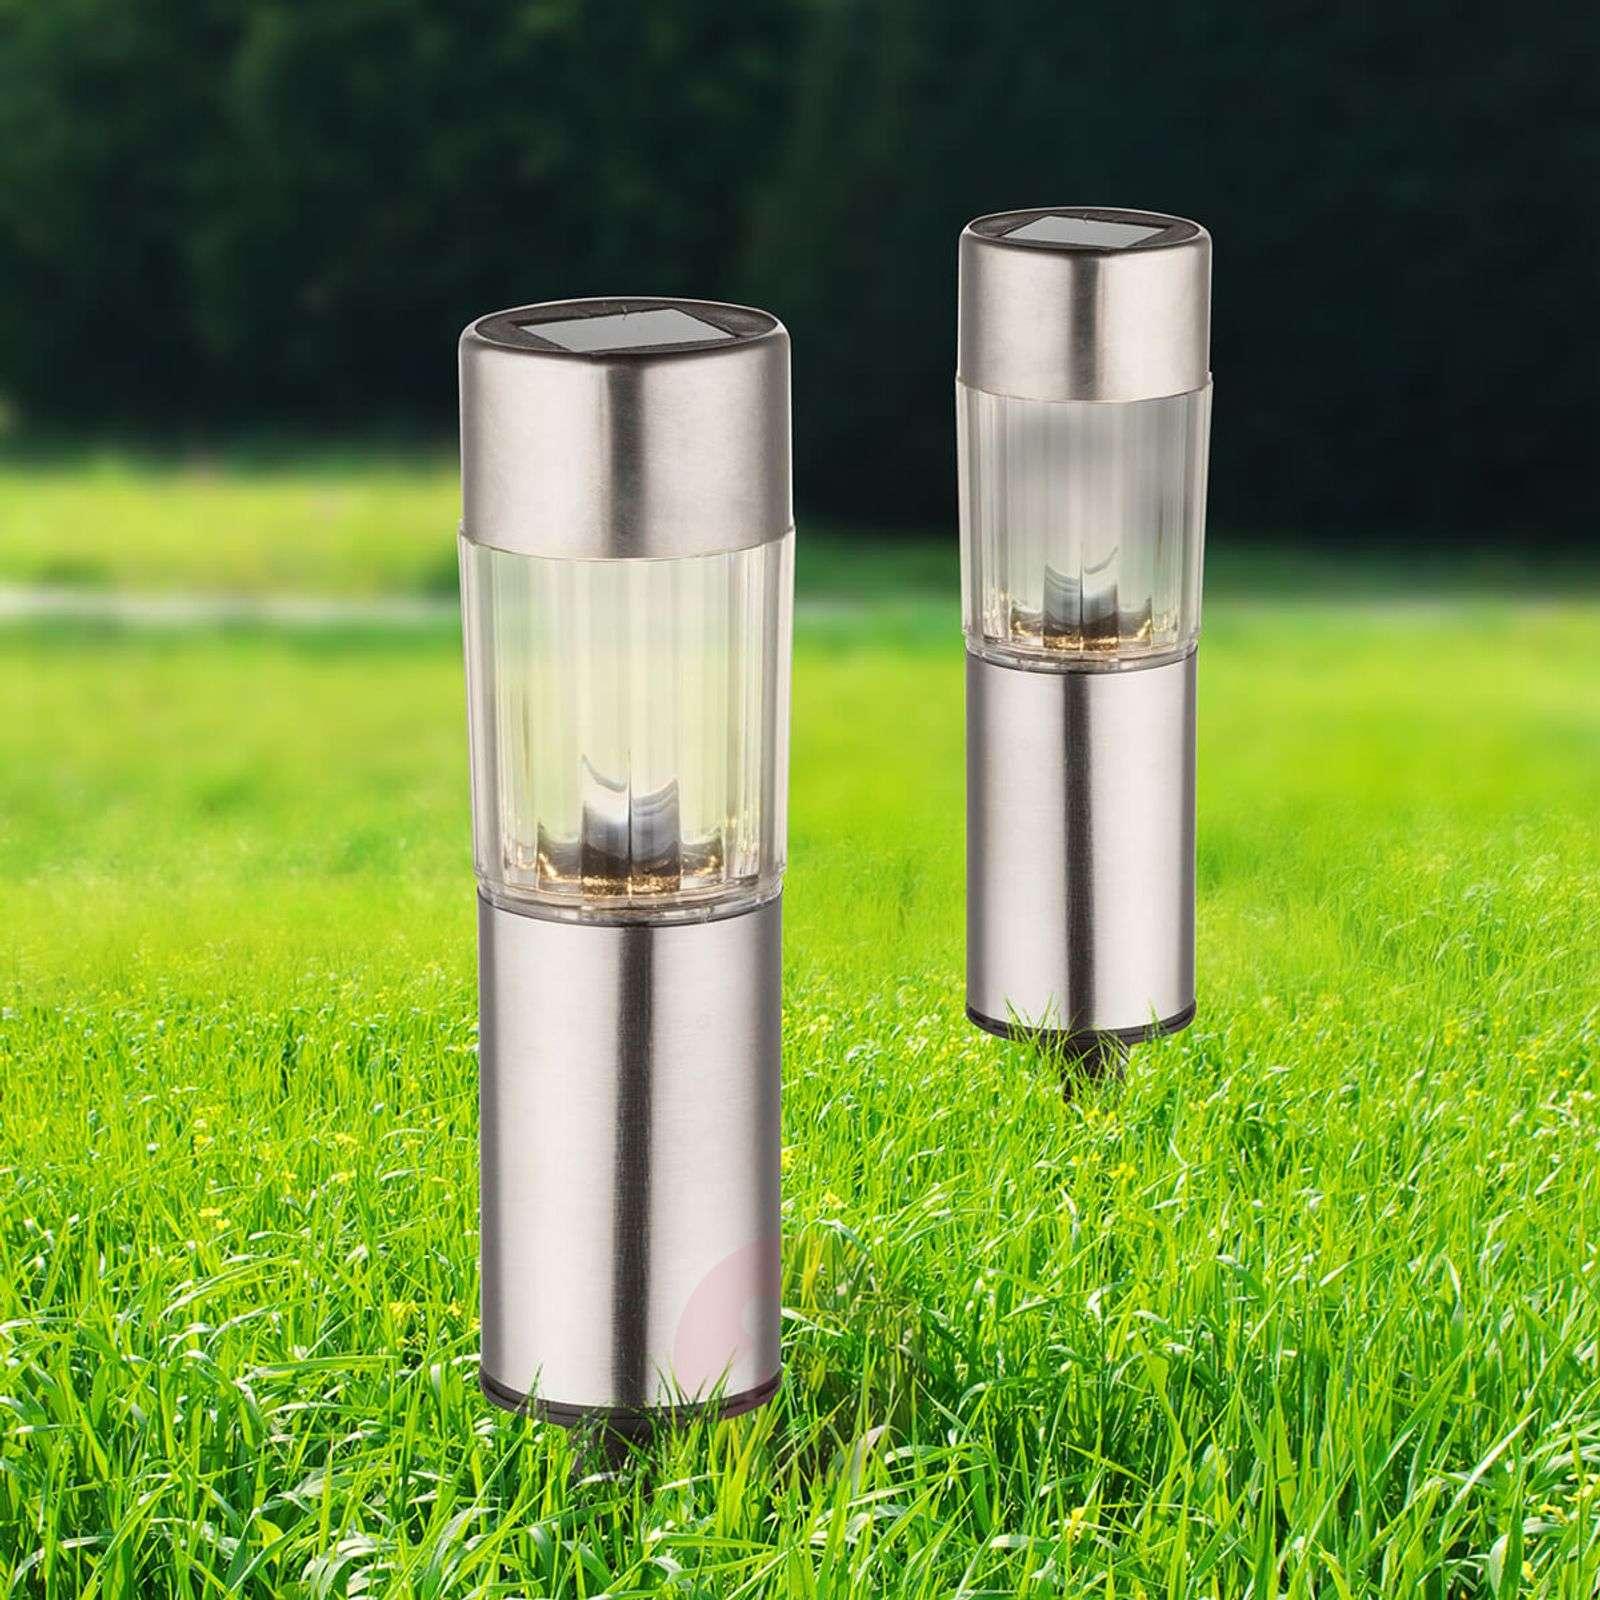 Set of 4 Aro LED solar dec. light wt ground spike-4014934-01